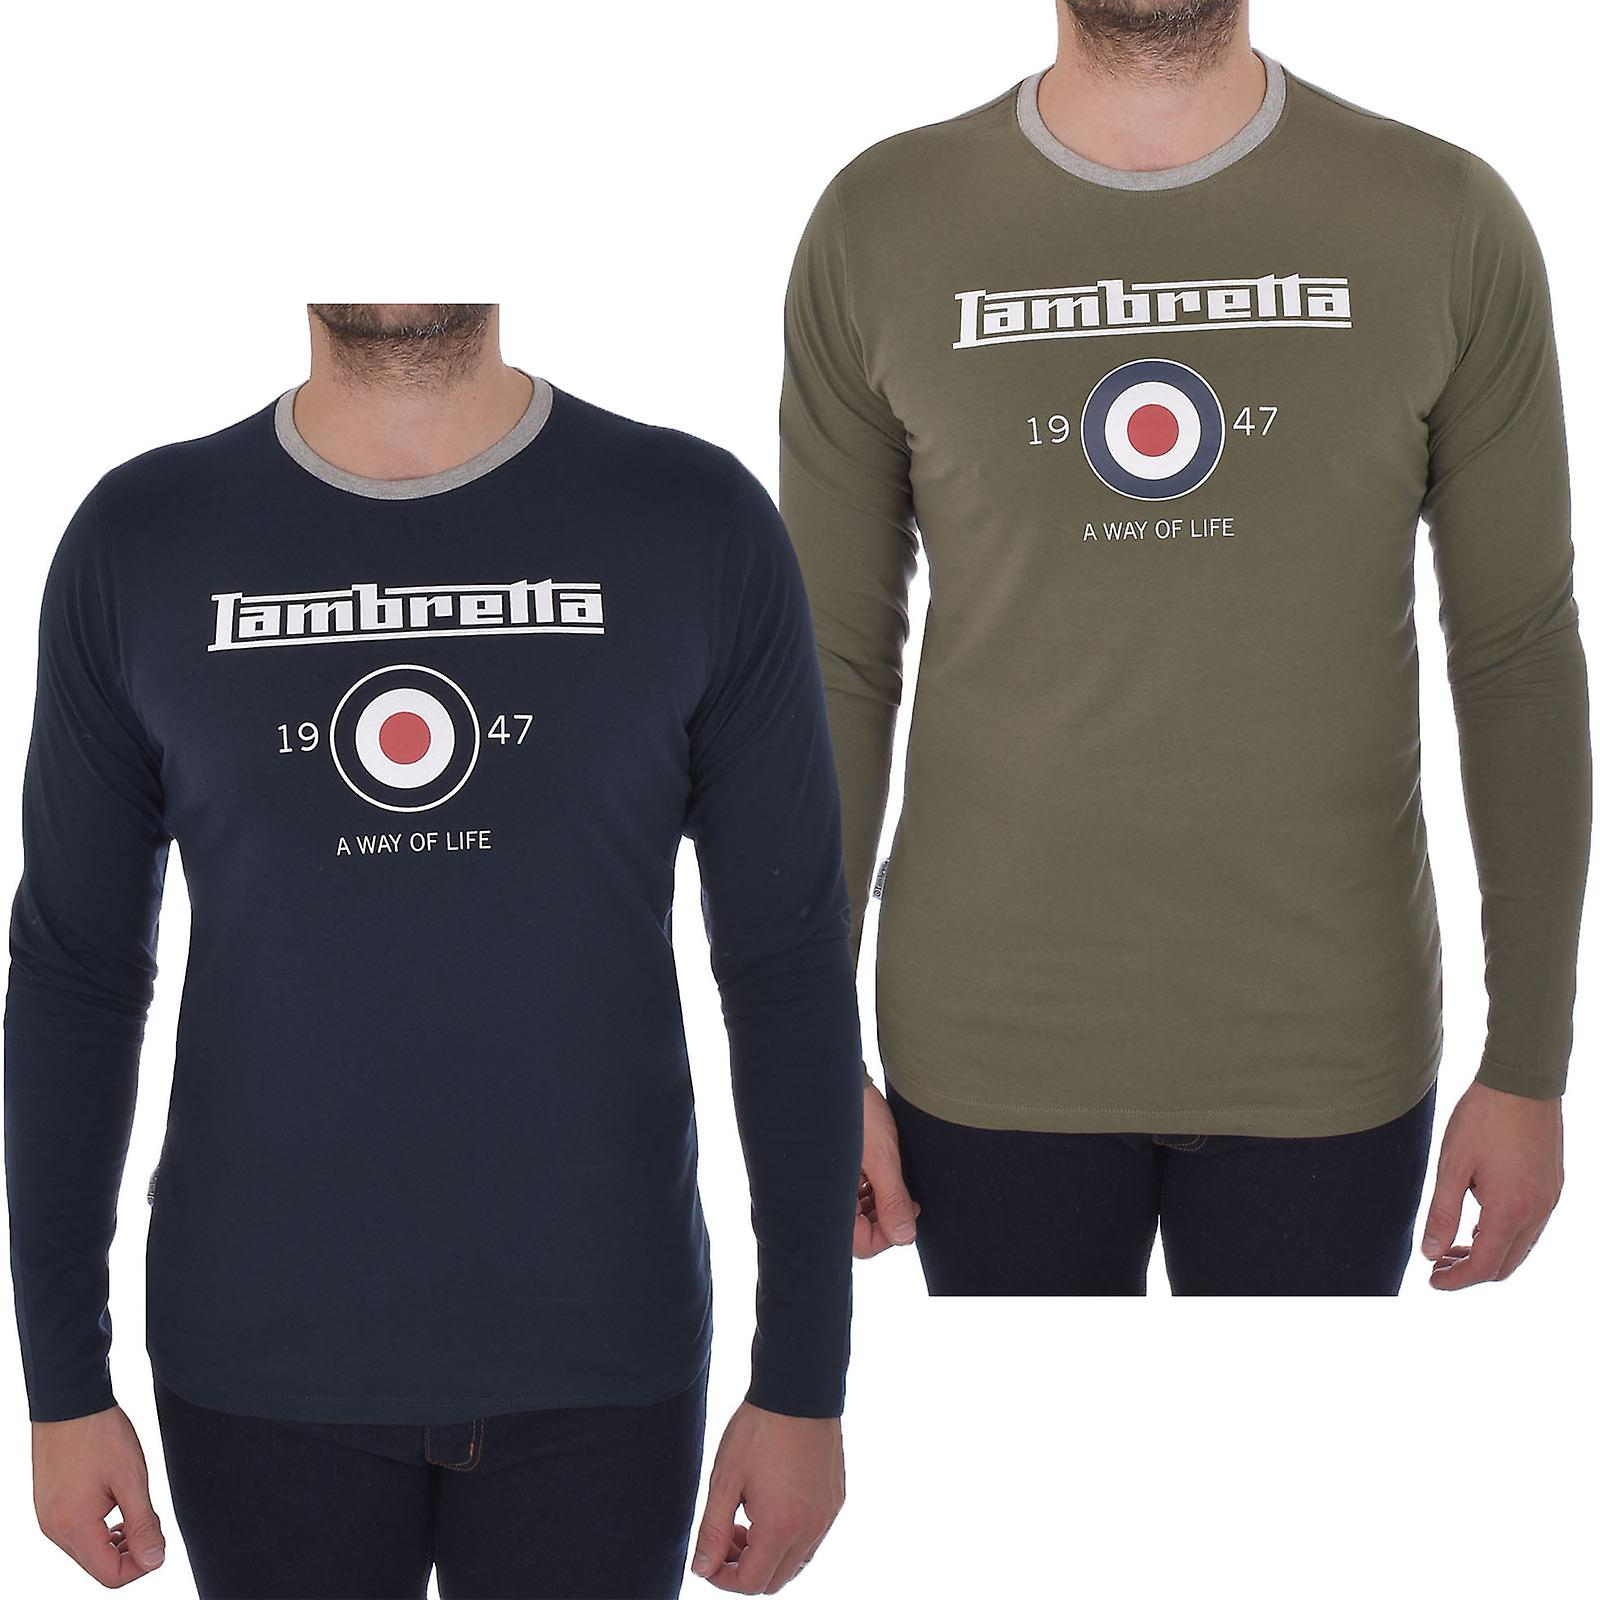 c3d17a2ea38edd Lambretta Herren Langarm Ringer Baumwolle lässig Rundhals T-Shirt T-Shirt  Top